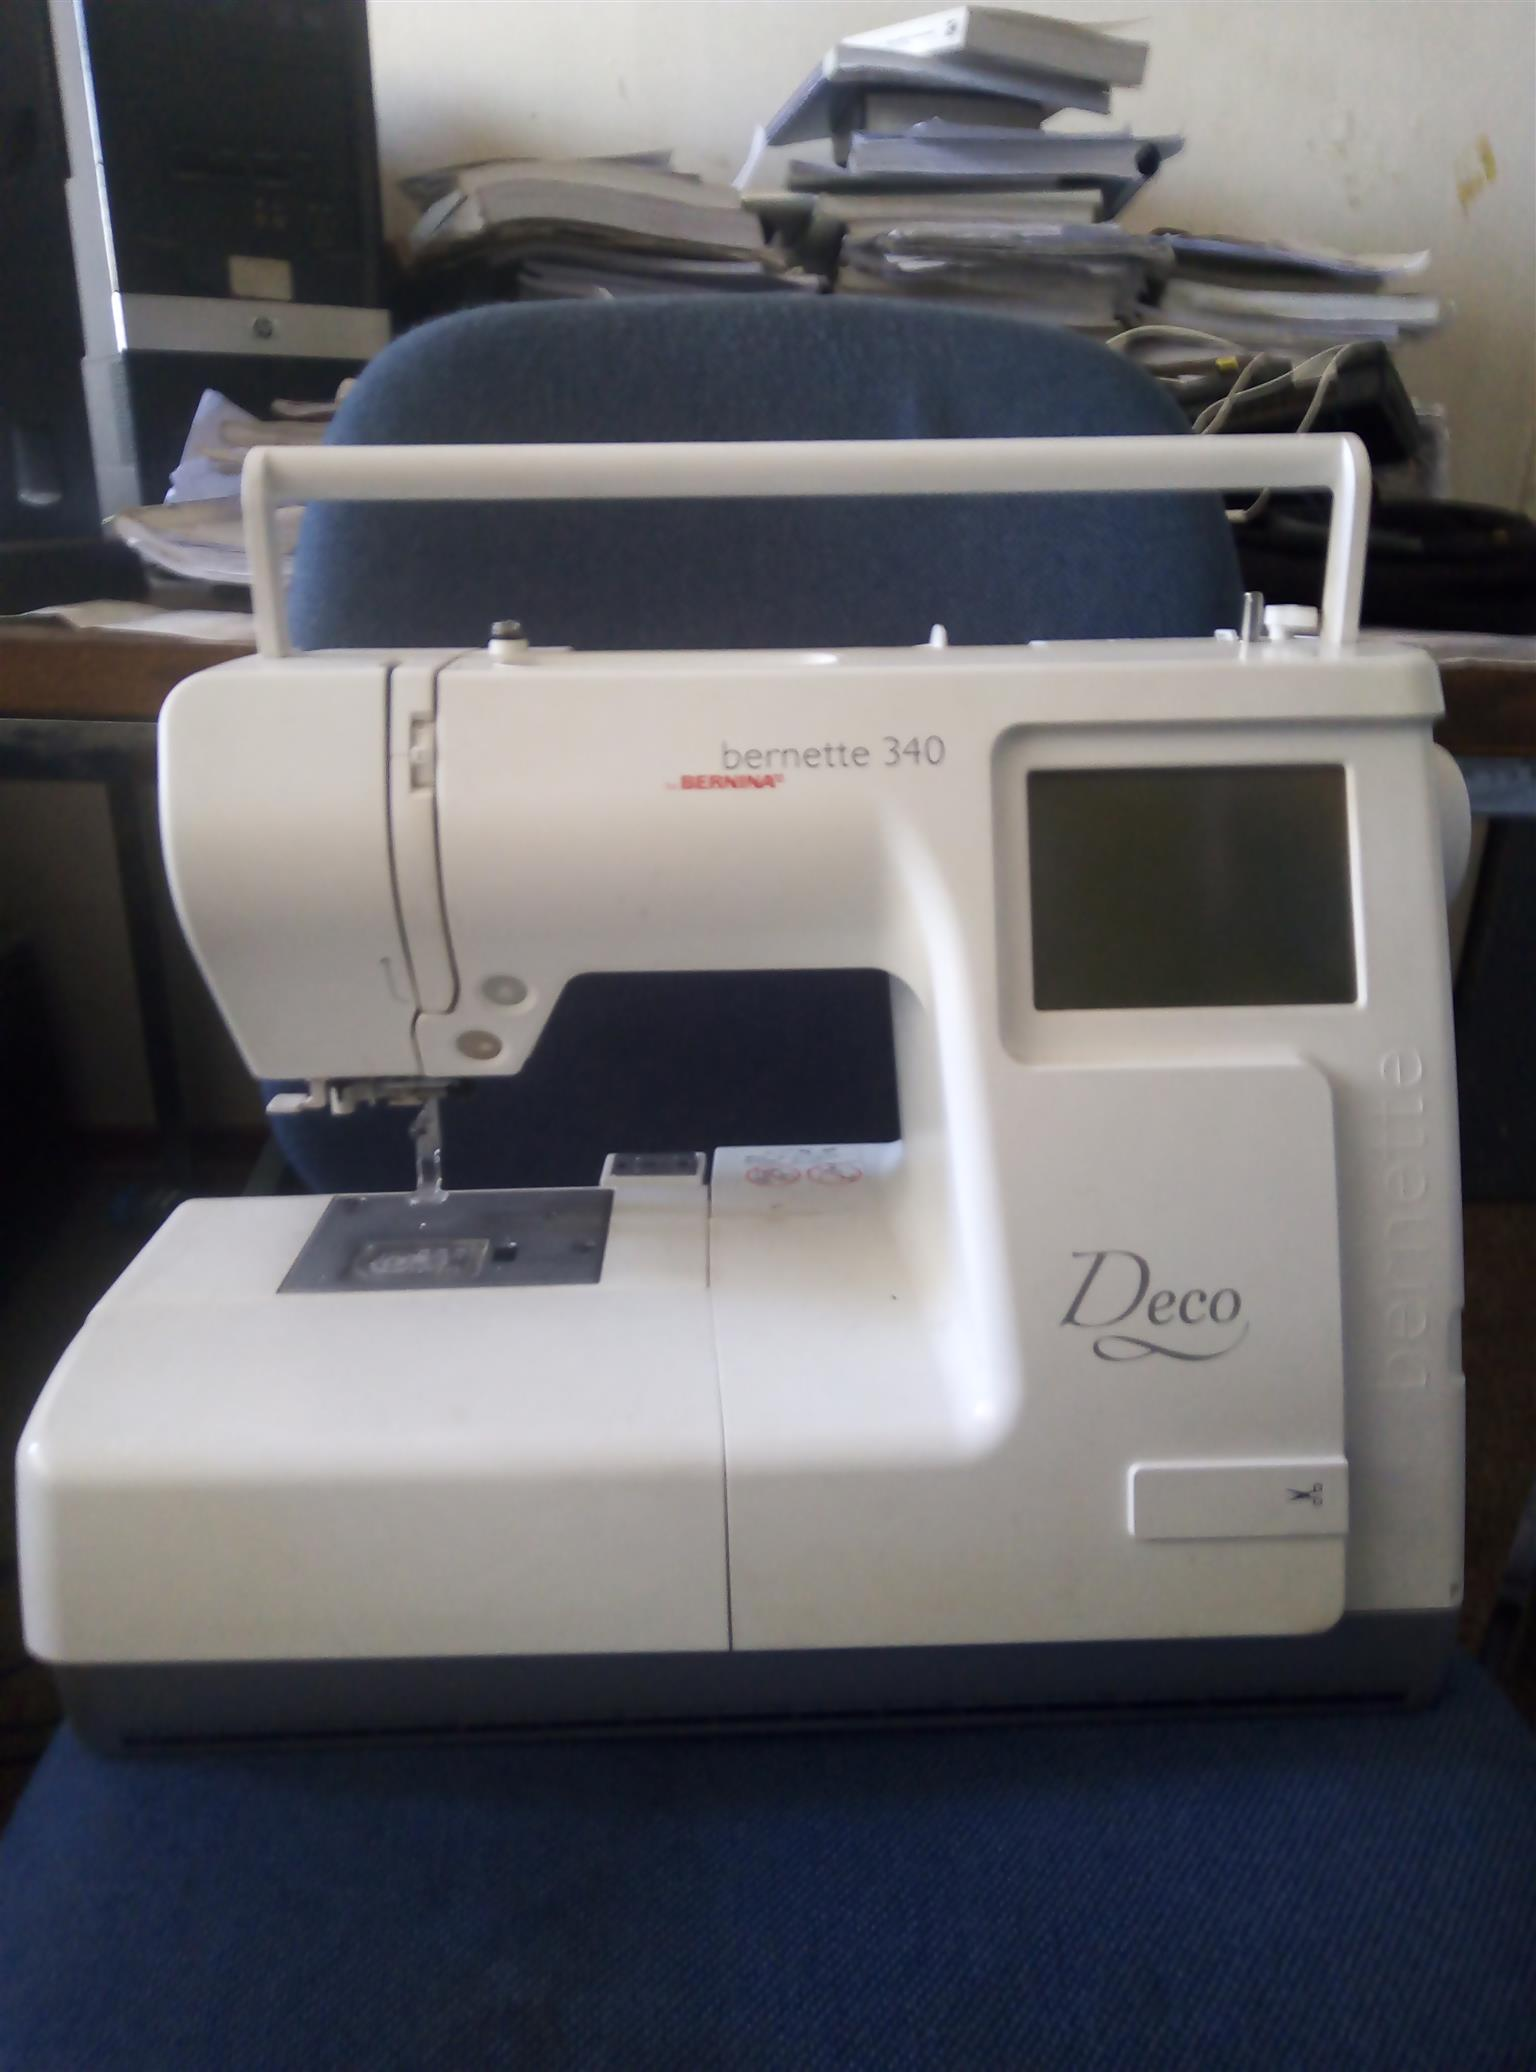 bernina 340 usb compactible embroidery machine for sale